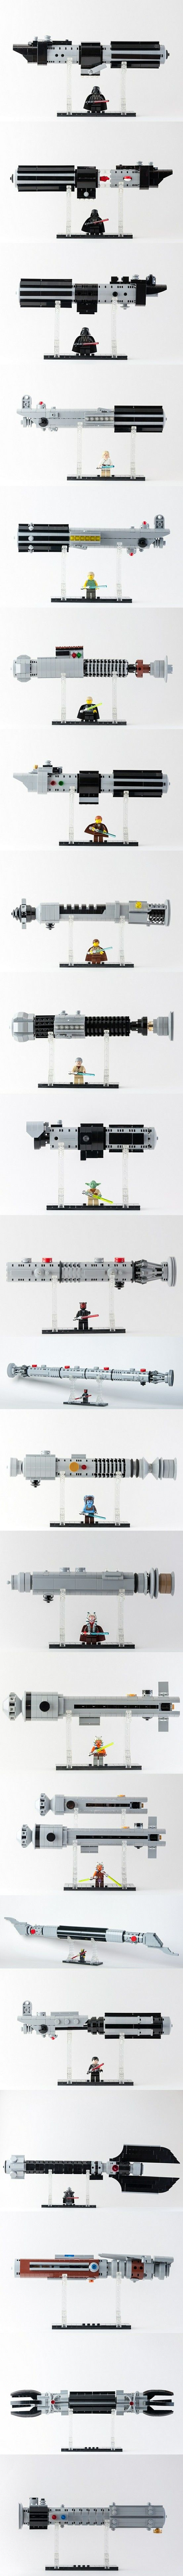 Lego Lightsabers